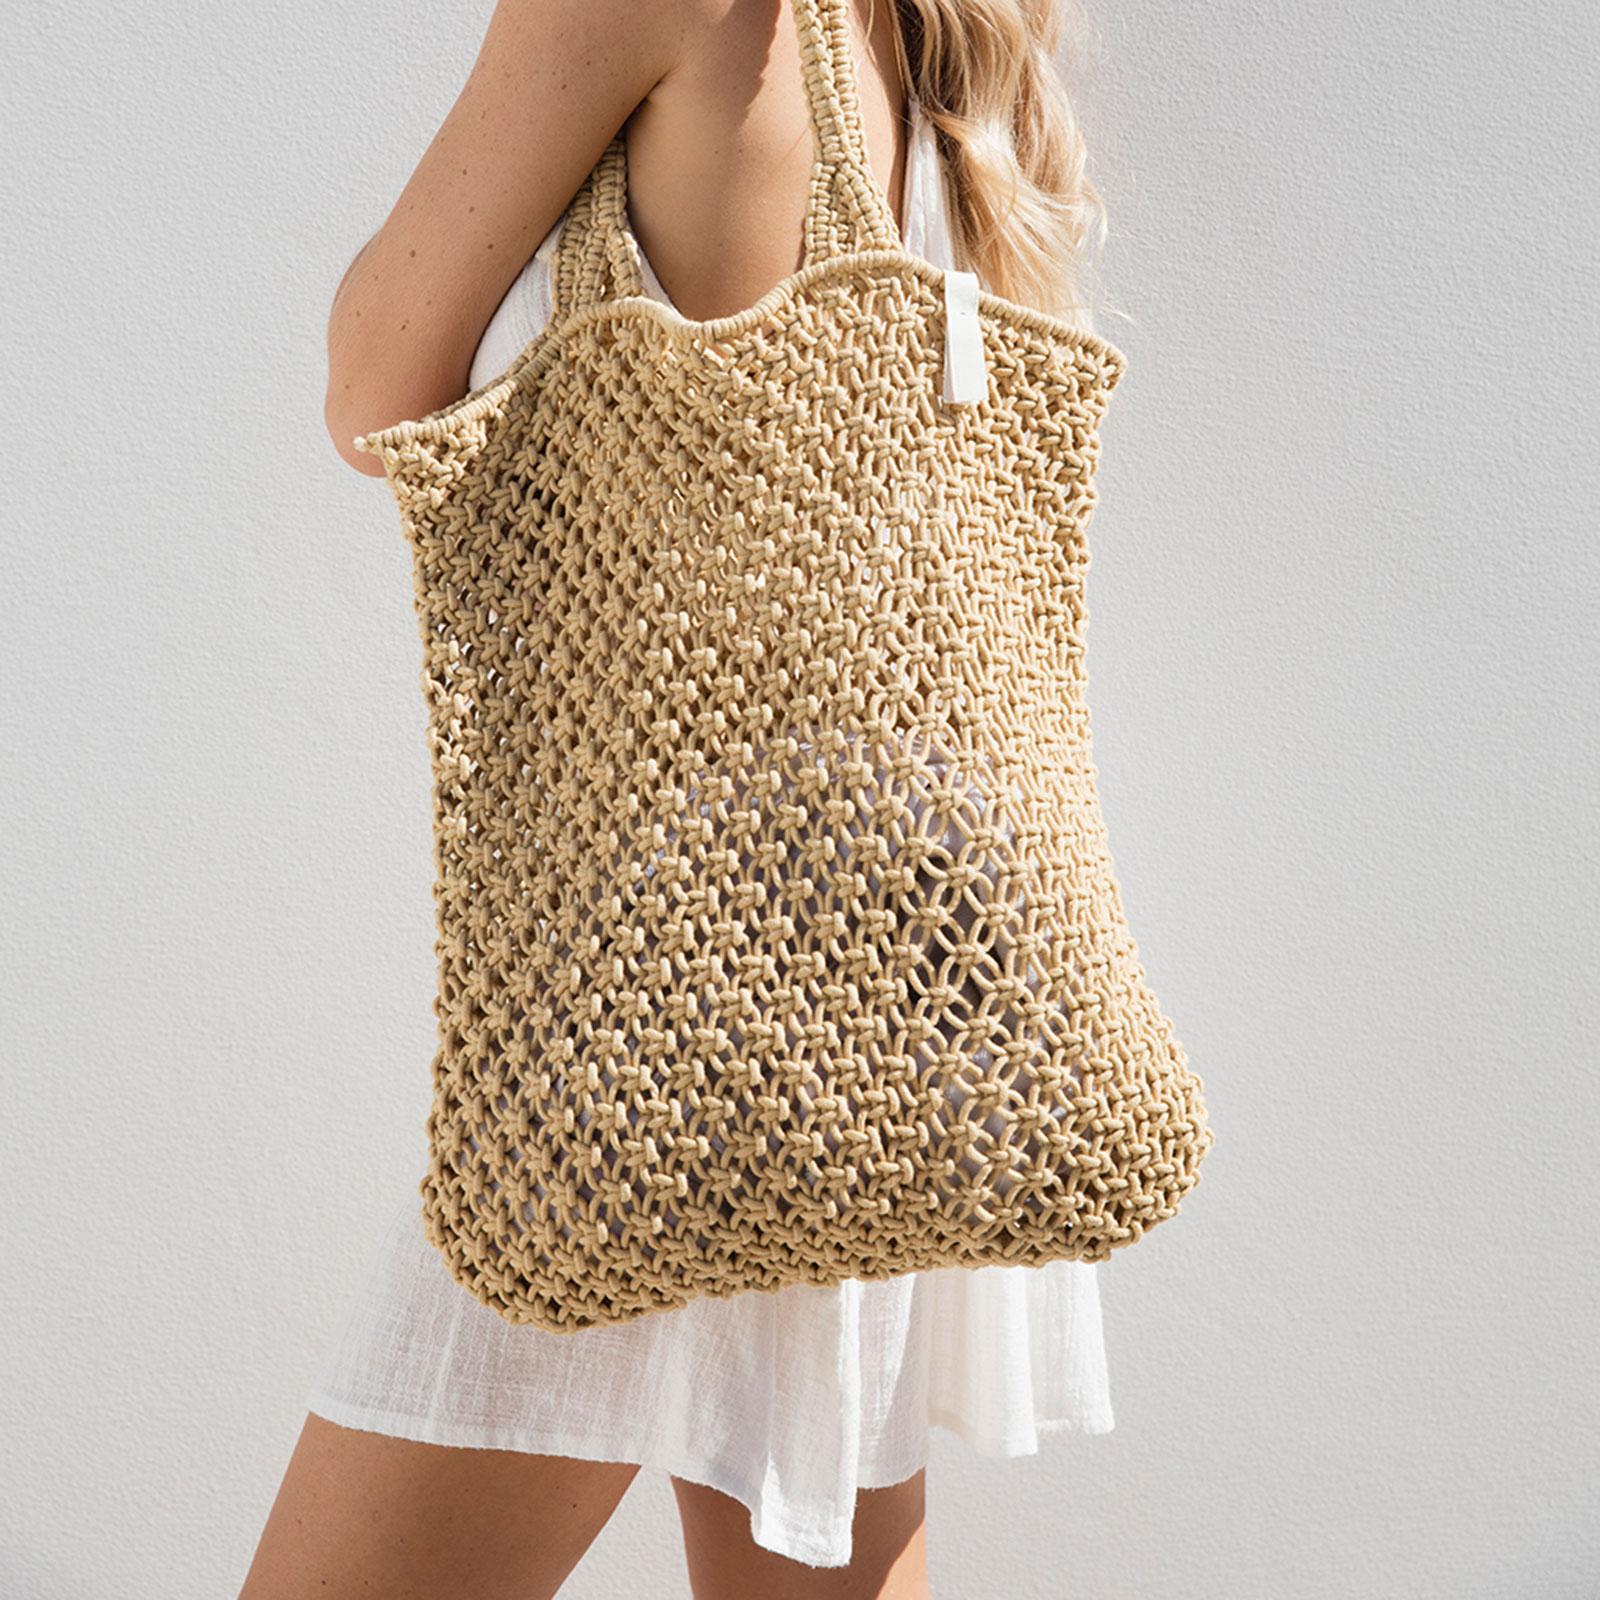 Natural Handmade Beige Macrame Shopping Bag Macrame Natural